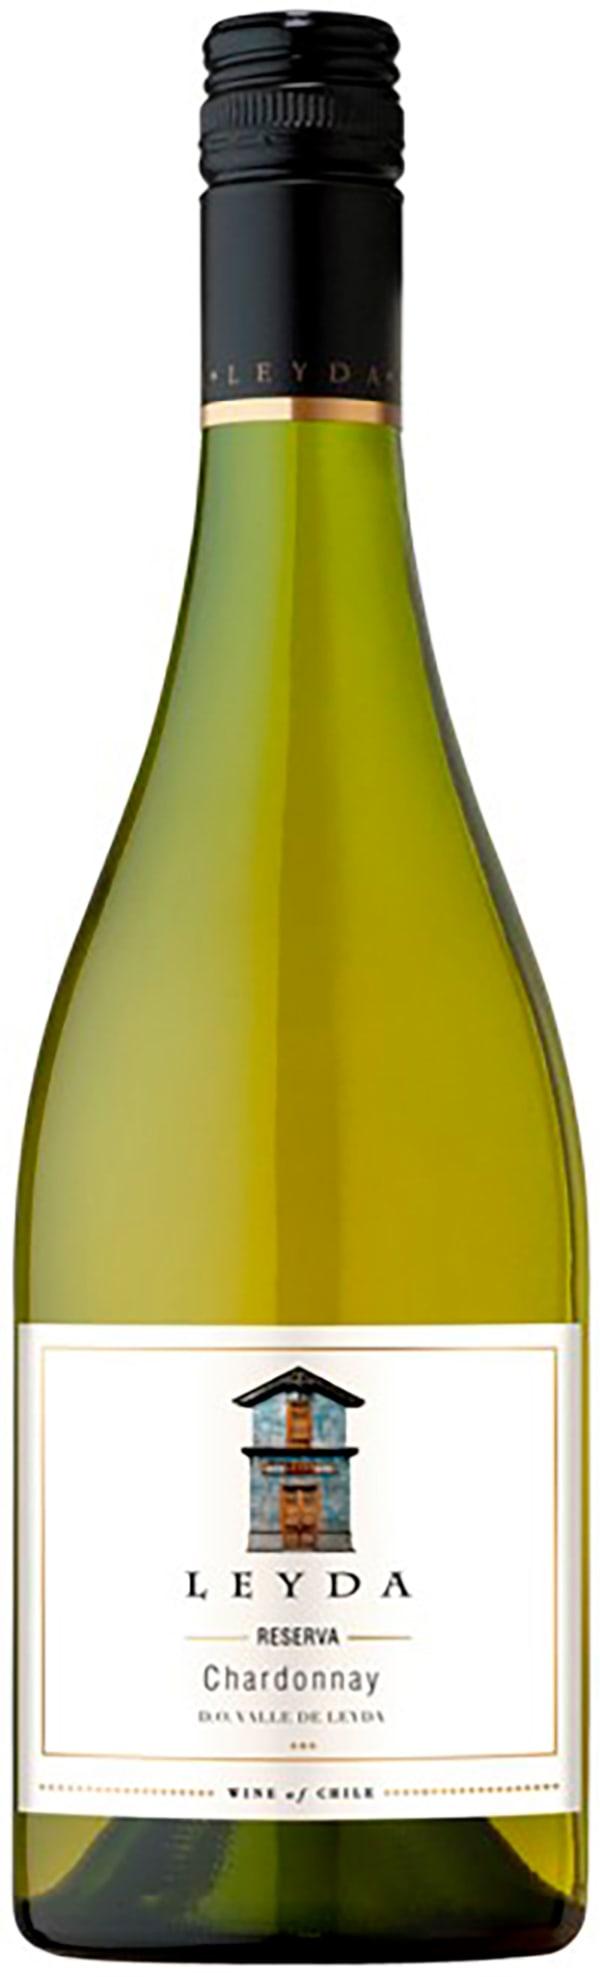 Leyda Reserva Chardonnay 2018